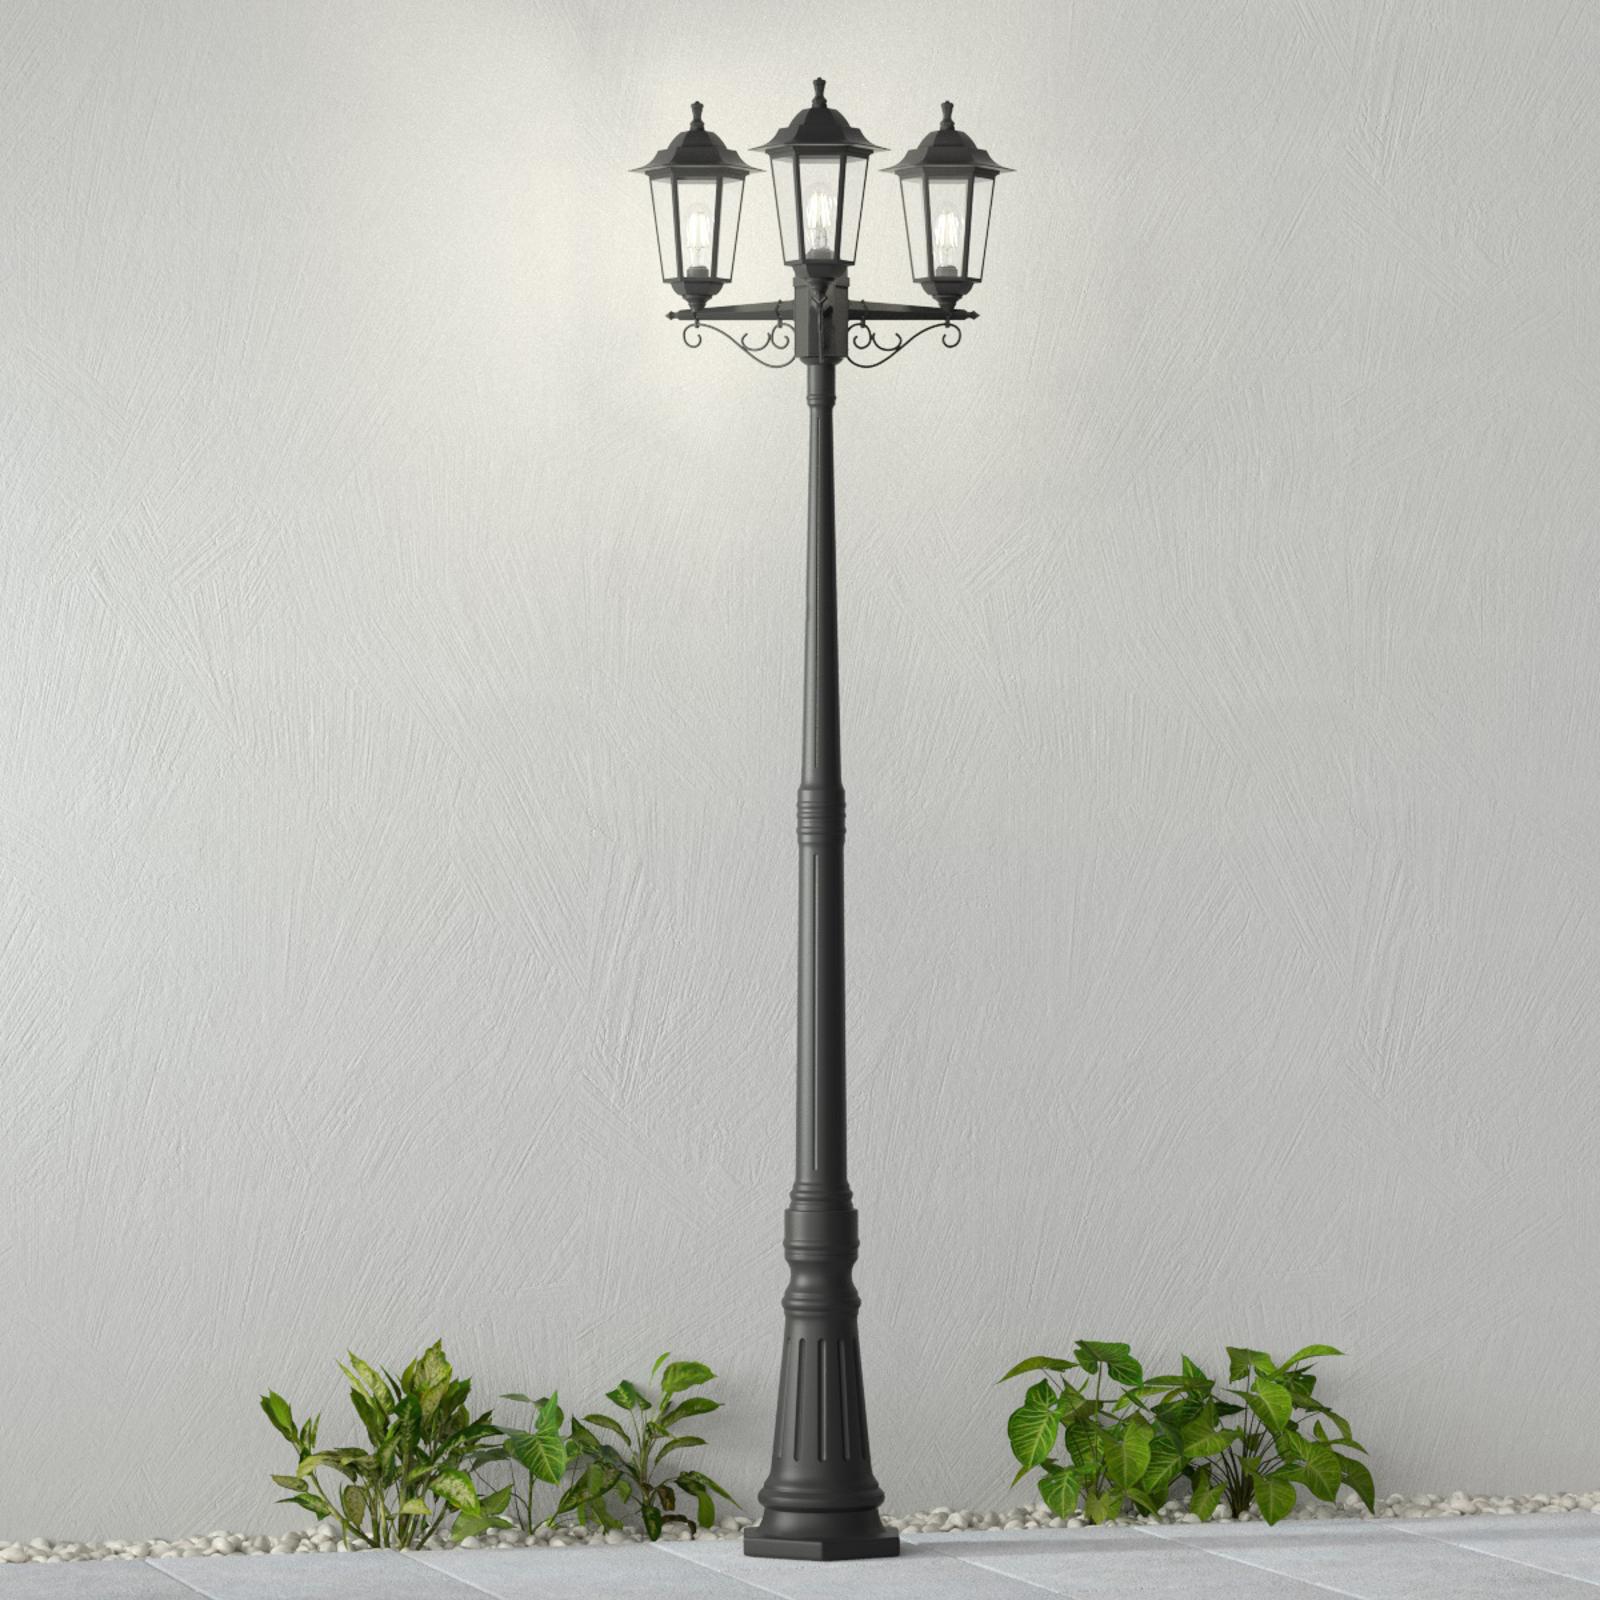 Lampe pour mât Nane lanterne, trois lampes